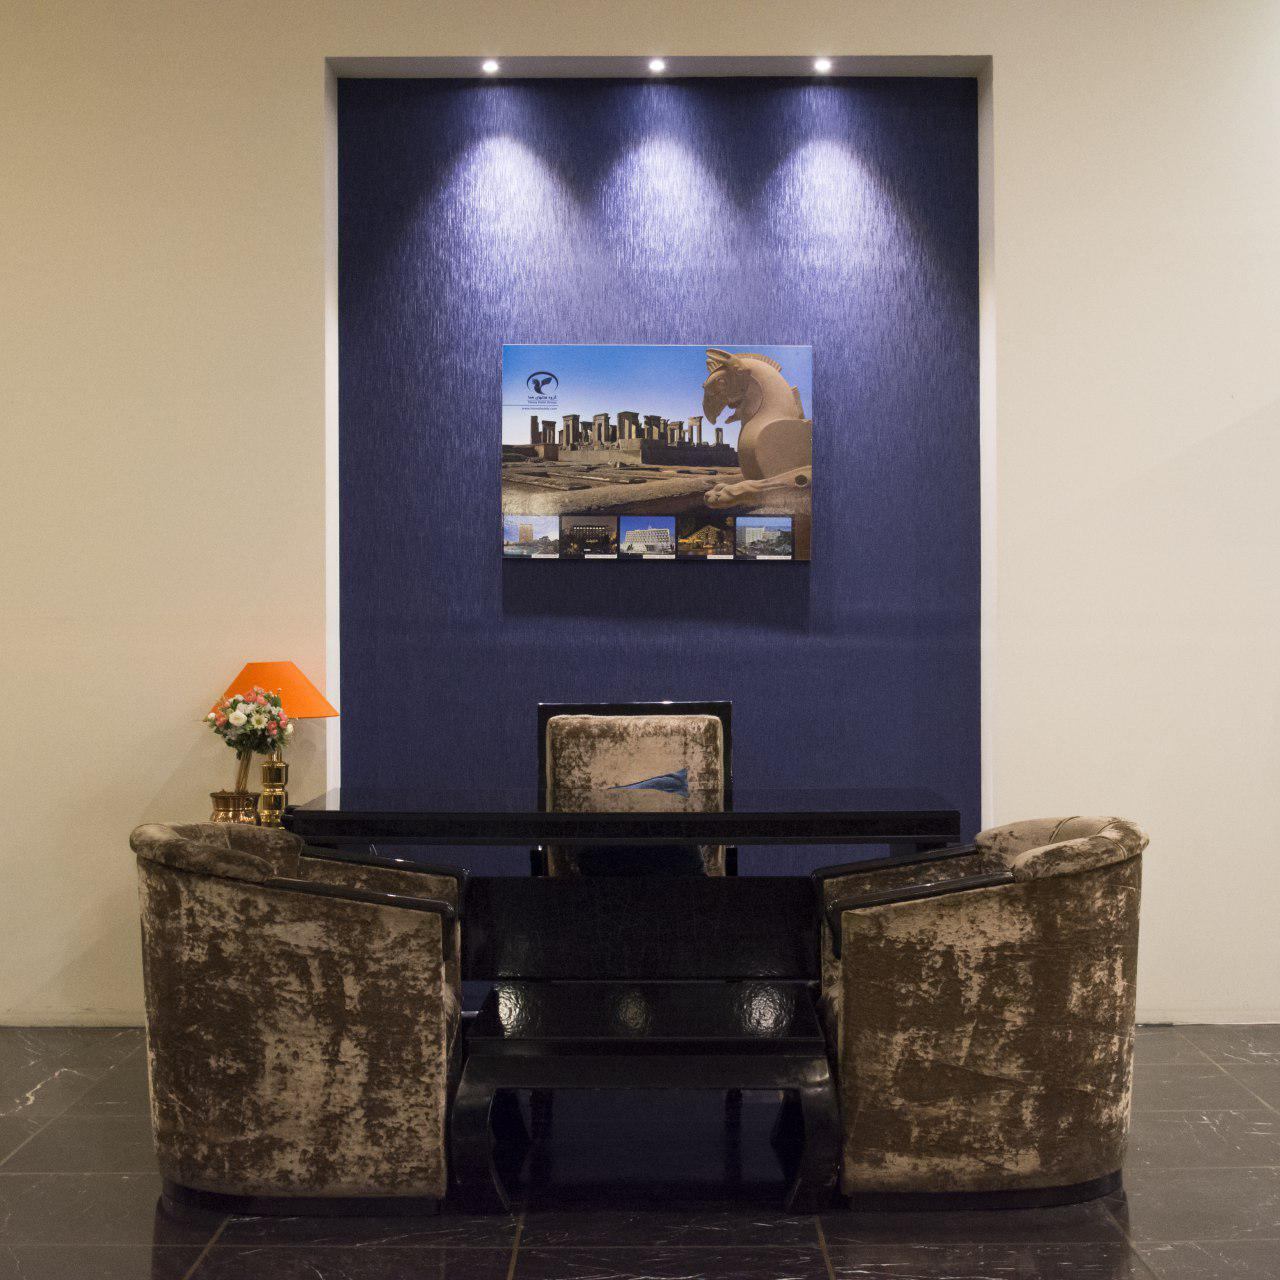 طراحي و چيدمان هتل هما تهران